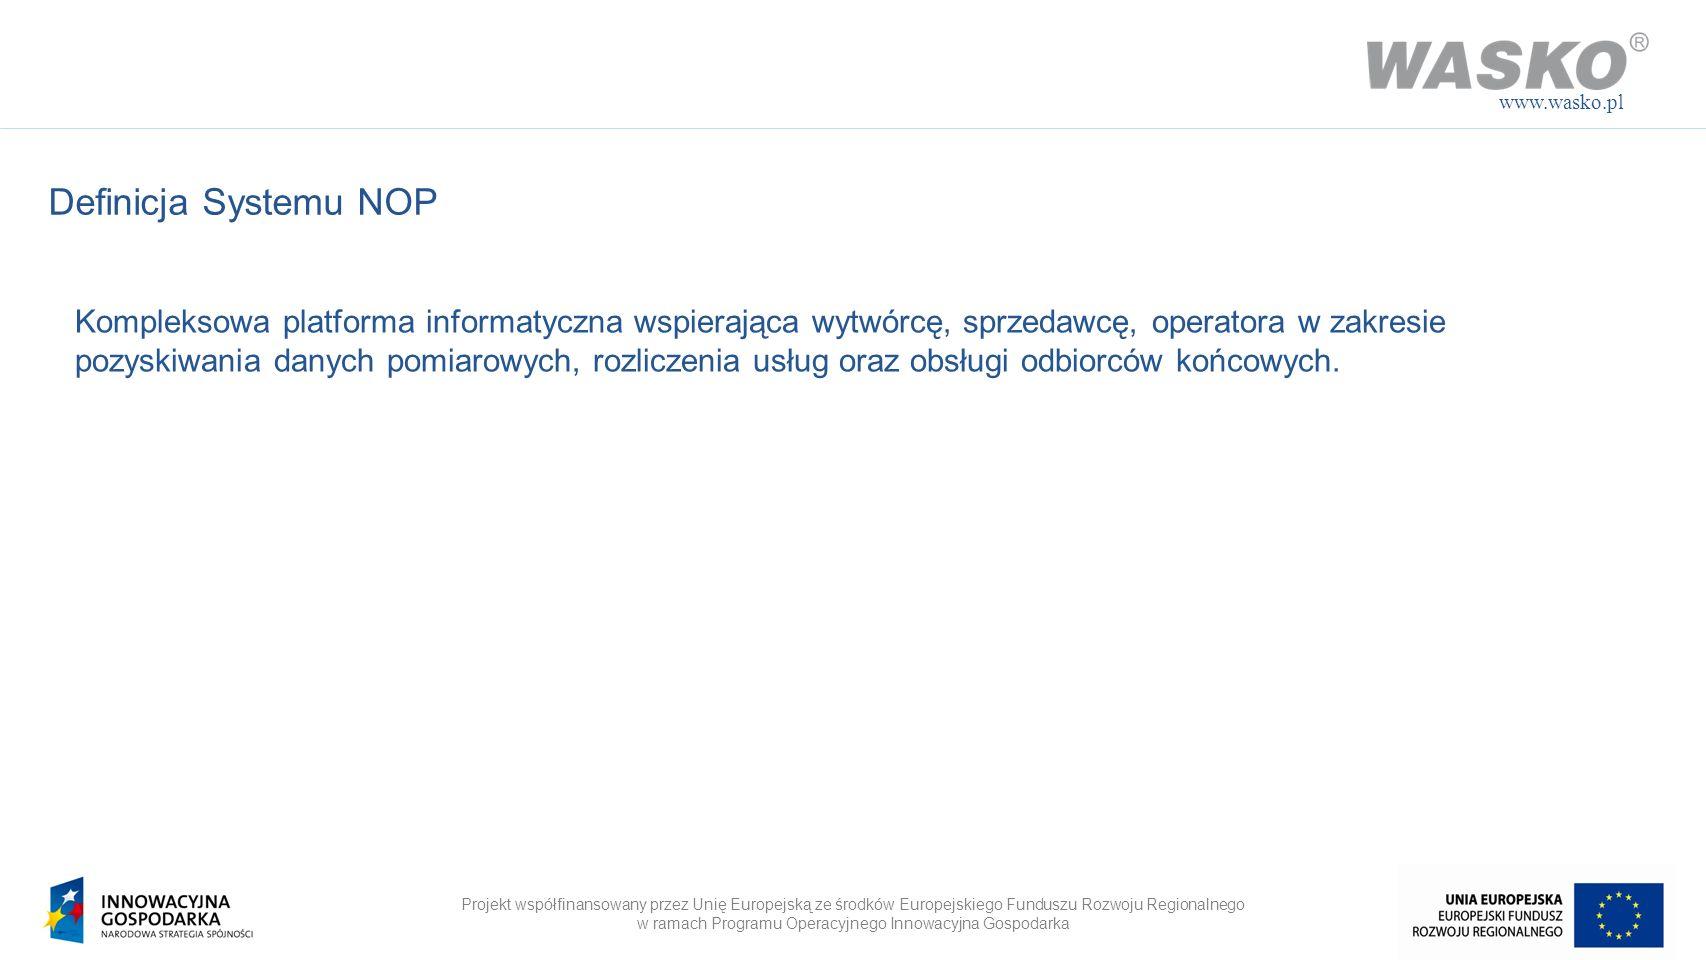 www.wasko.plDefinicja Systemu NOP.